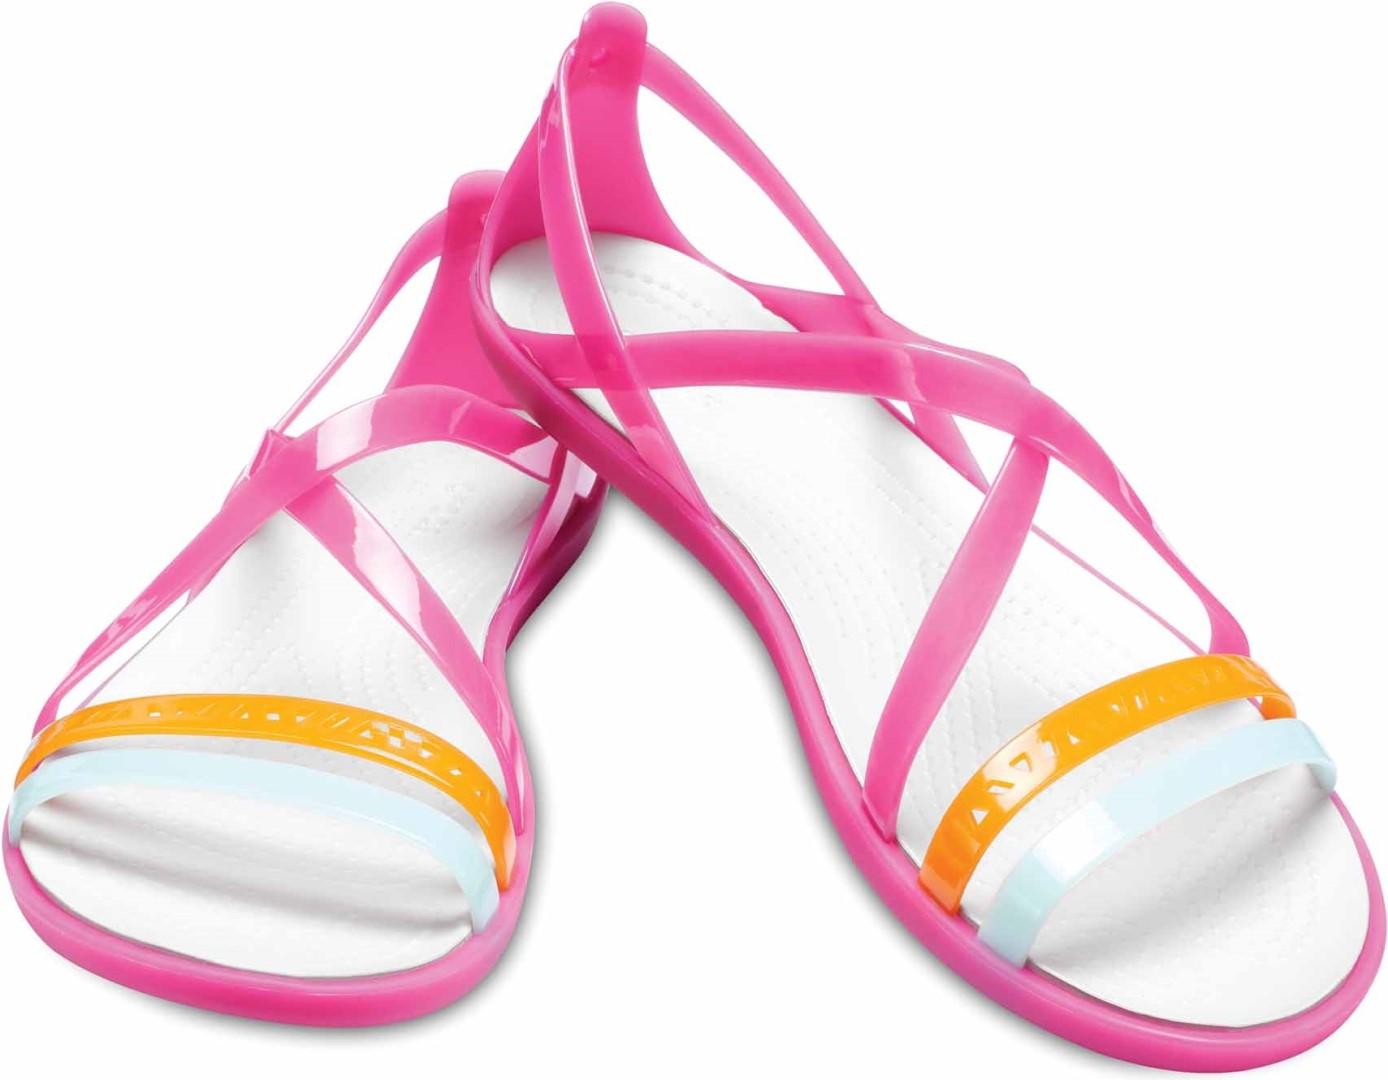 42f210e1ec64 Dámské sandále Crocs ISABELLA Strappy růžová 39-40